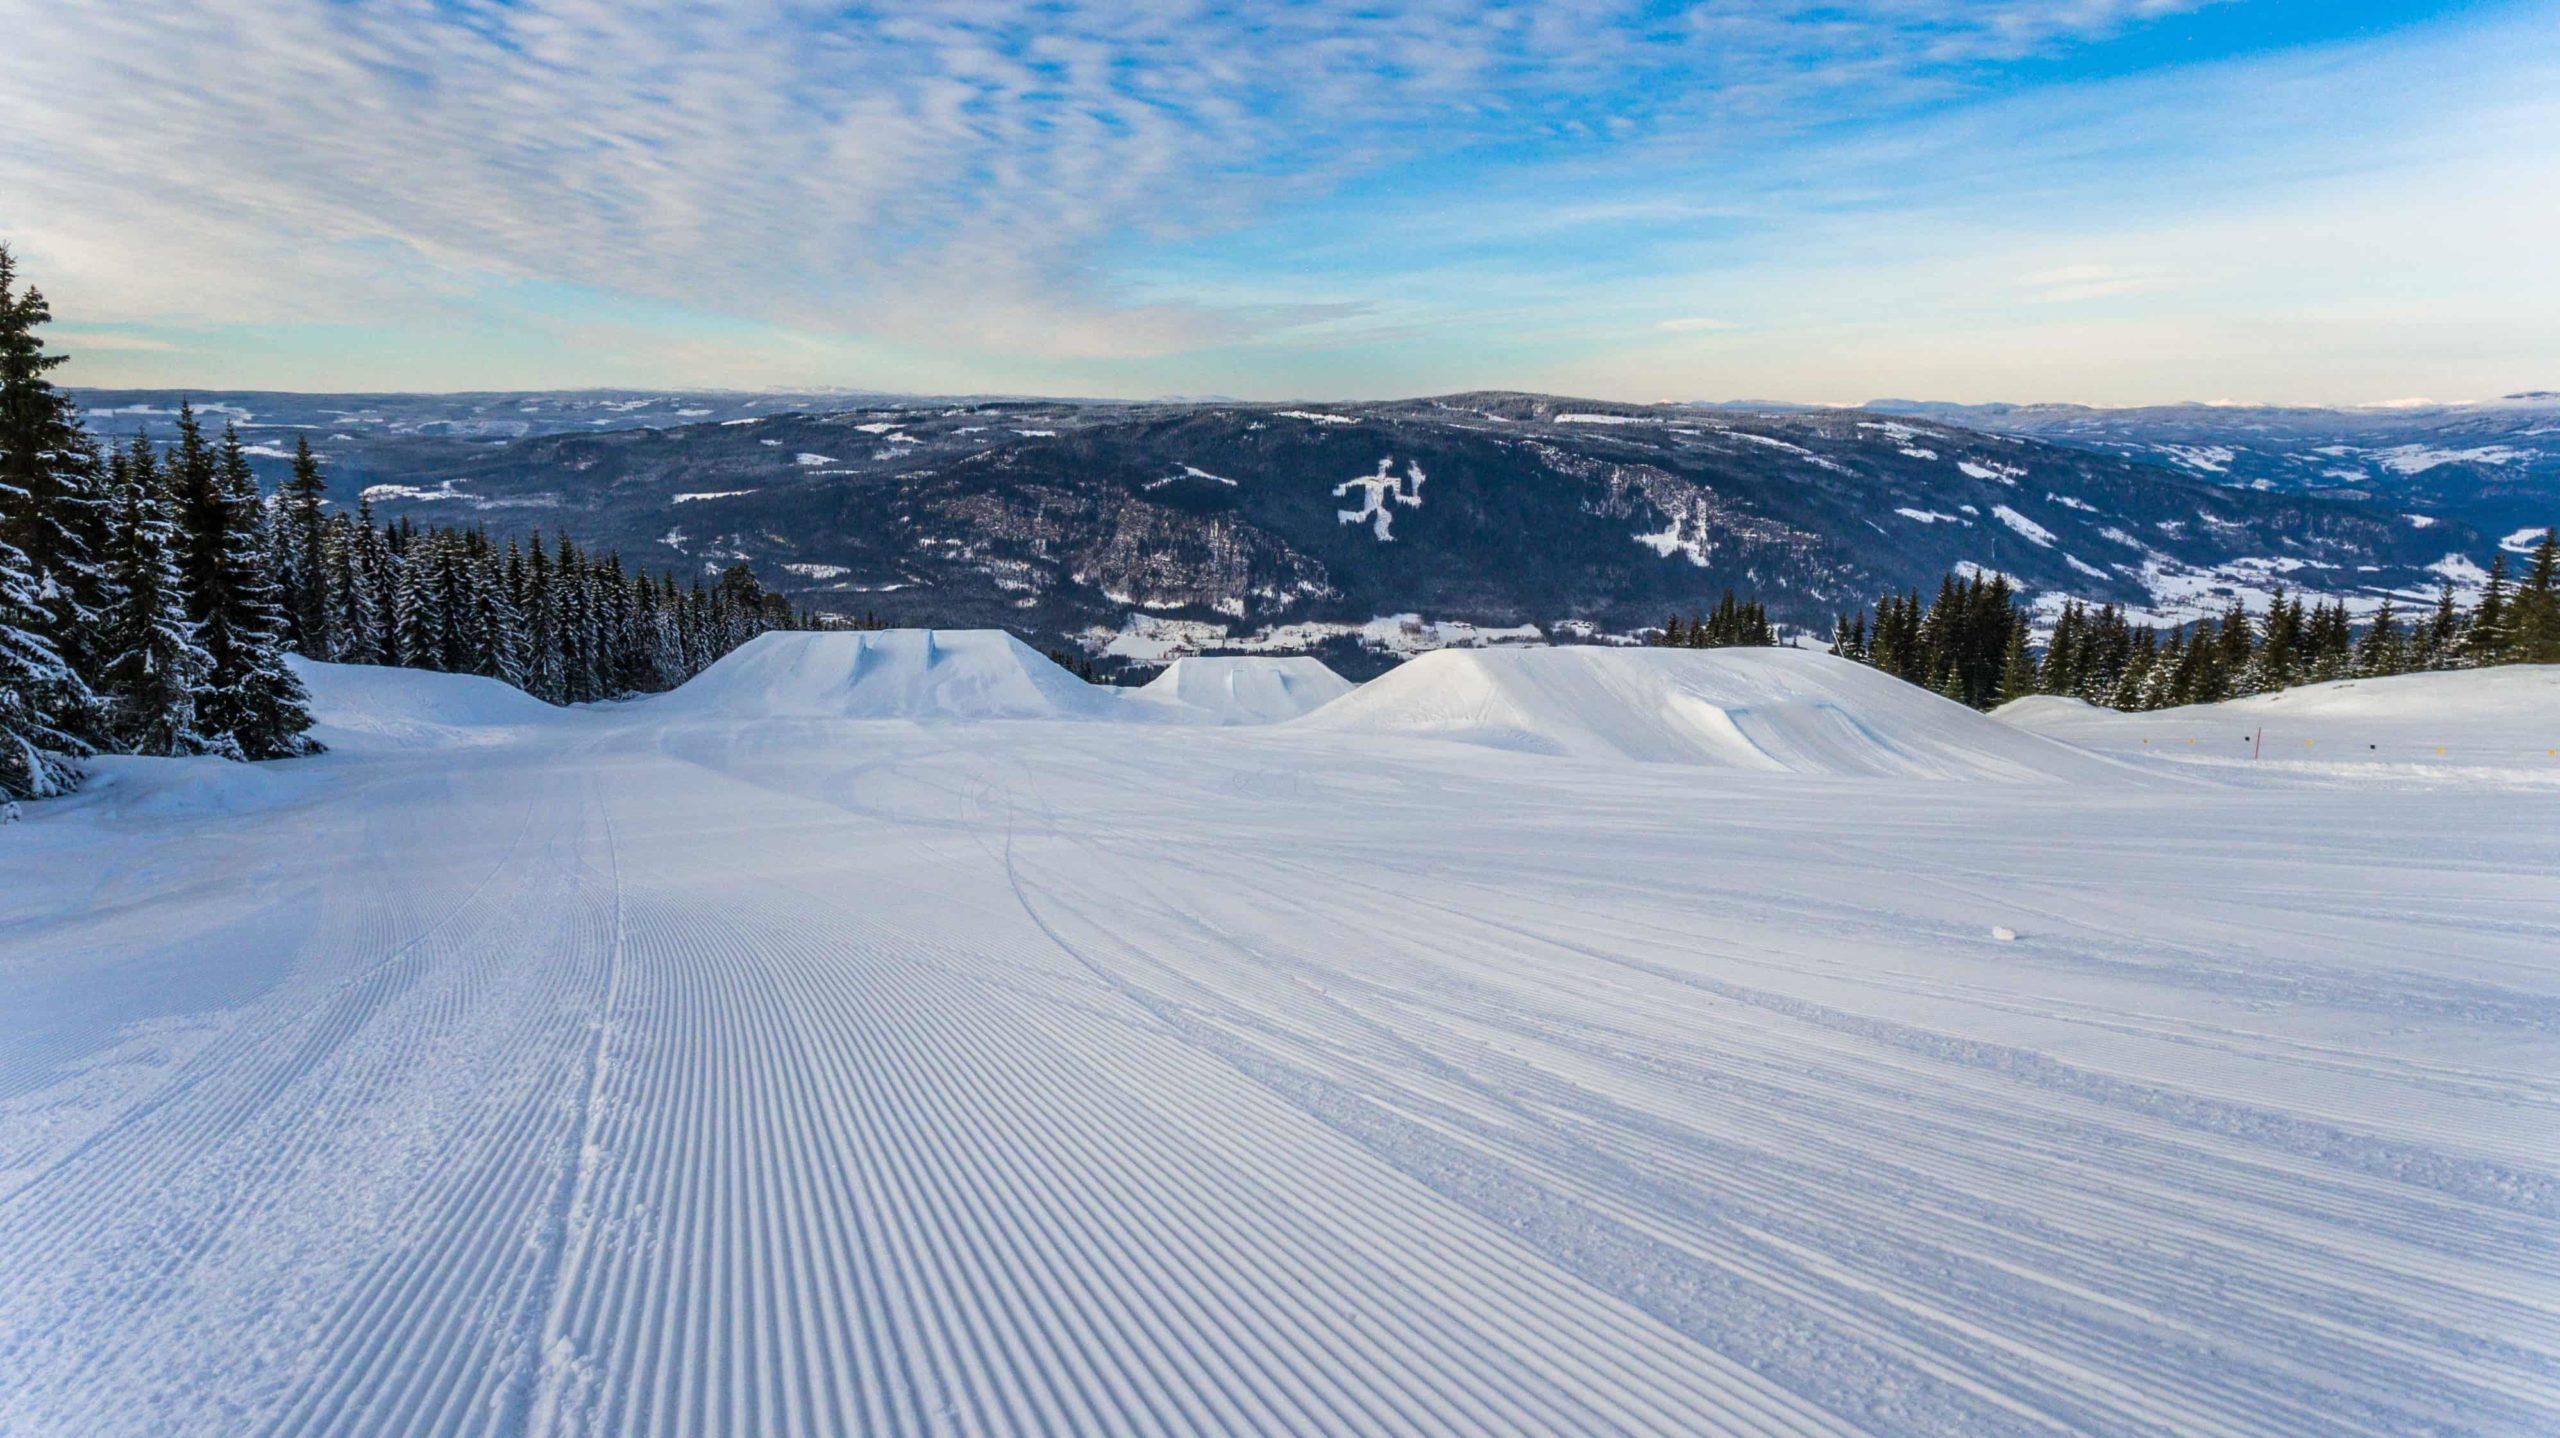 Snow slopes at a ski resort in the Alps